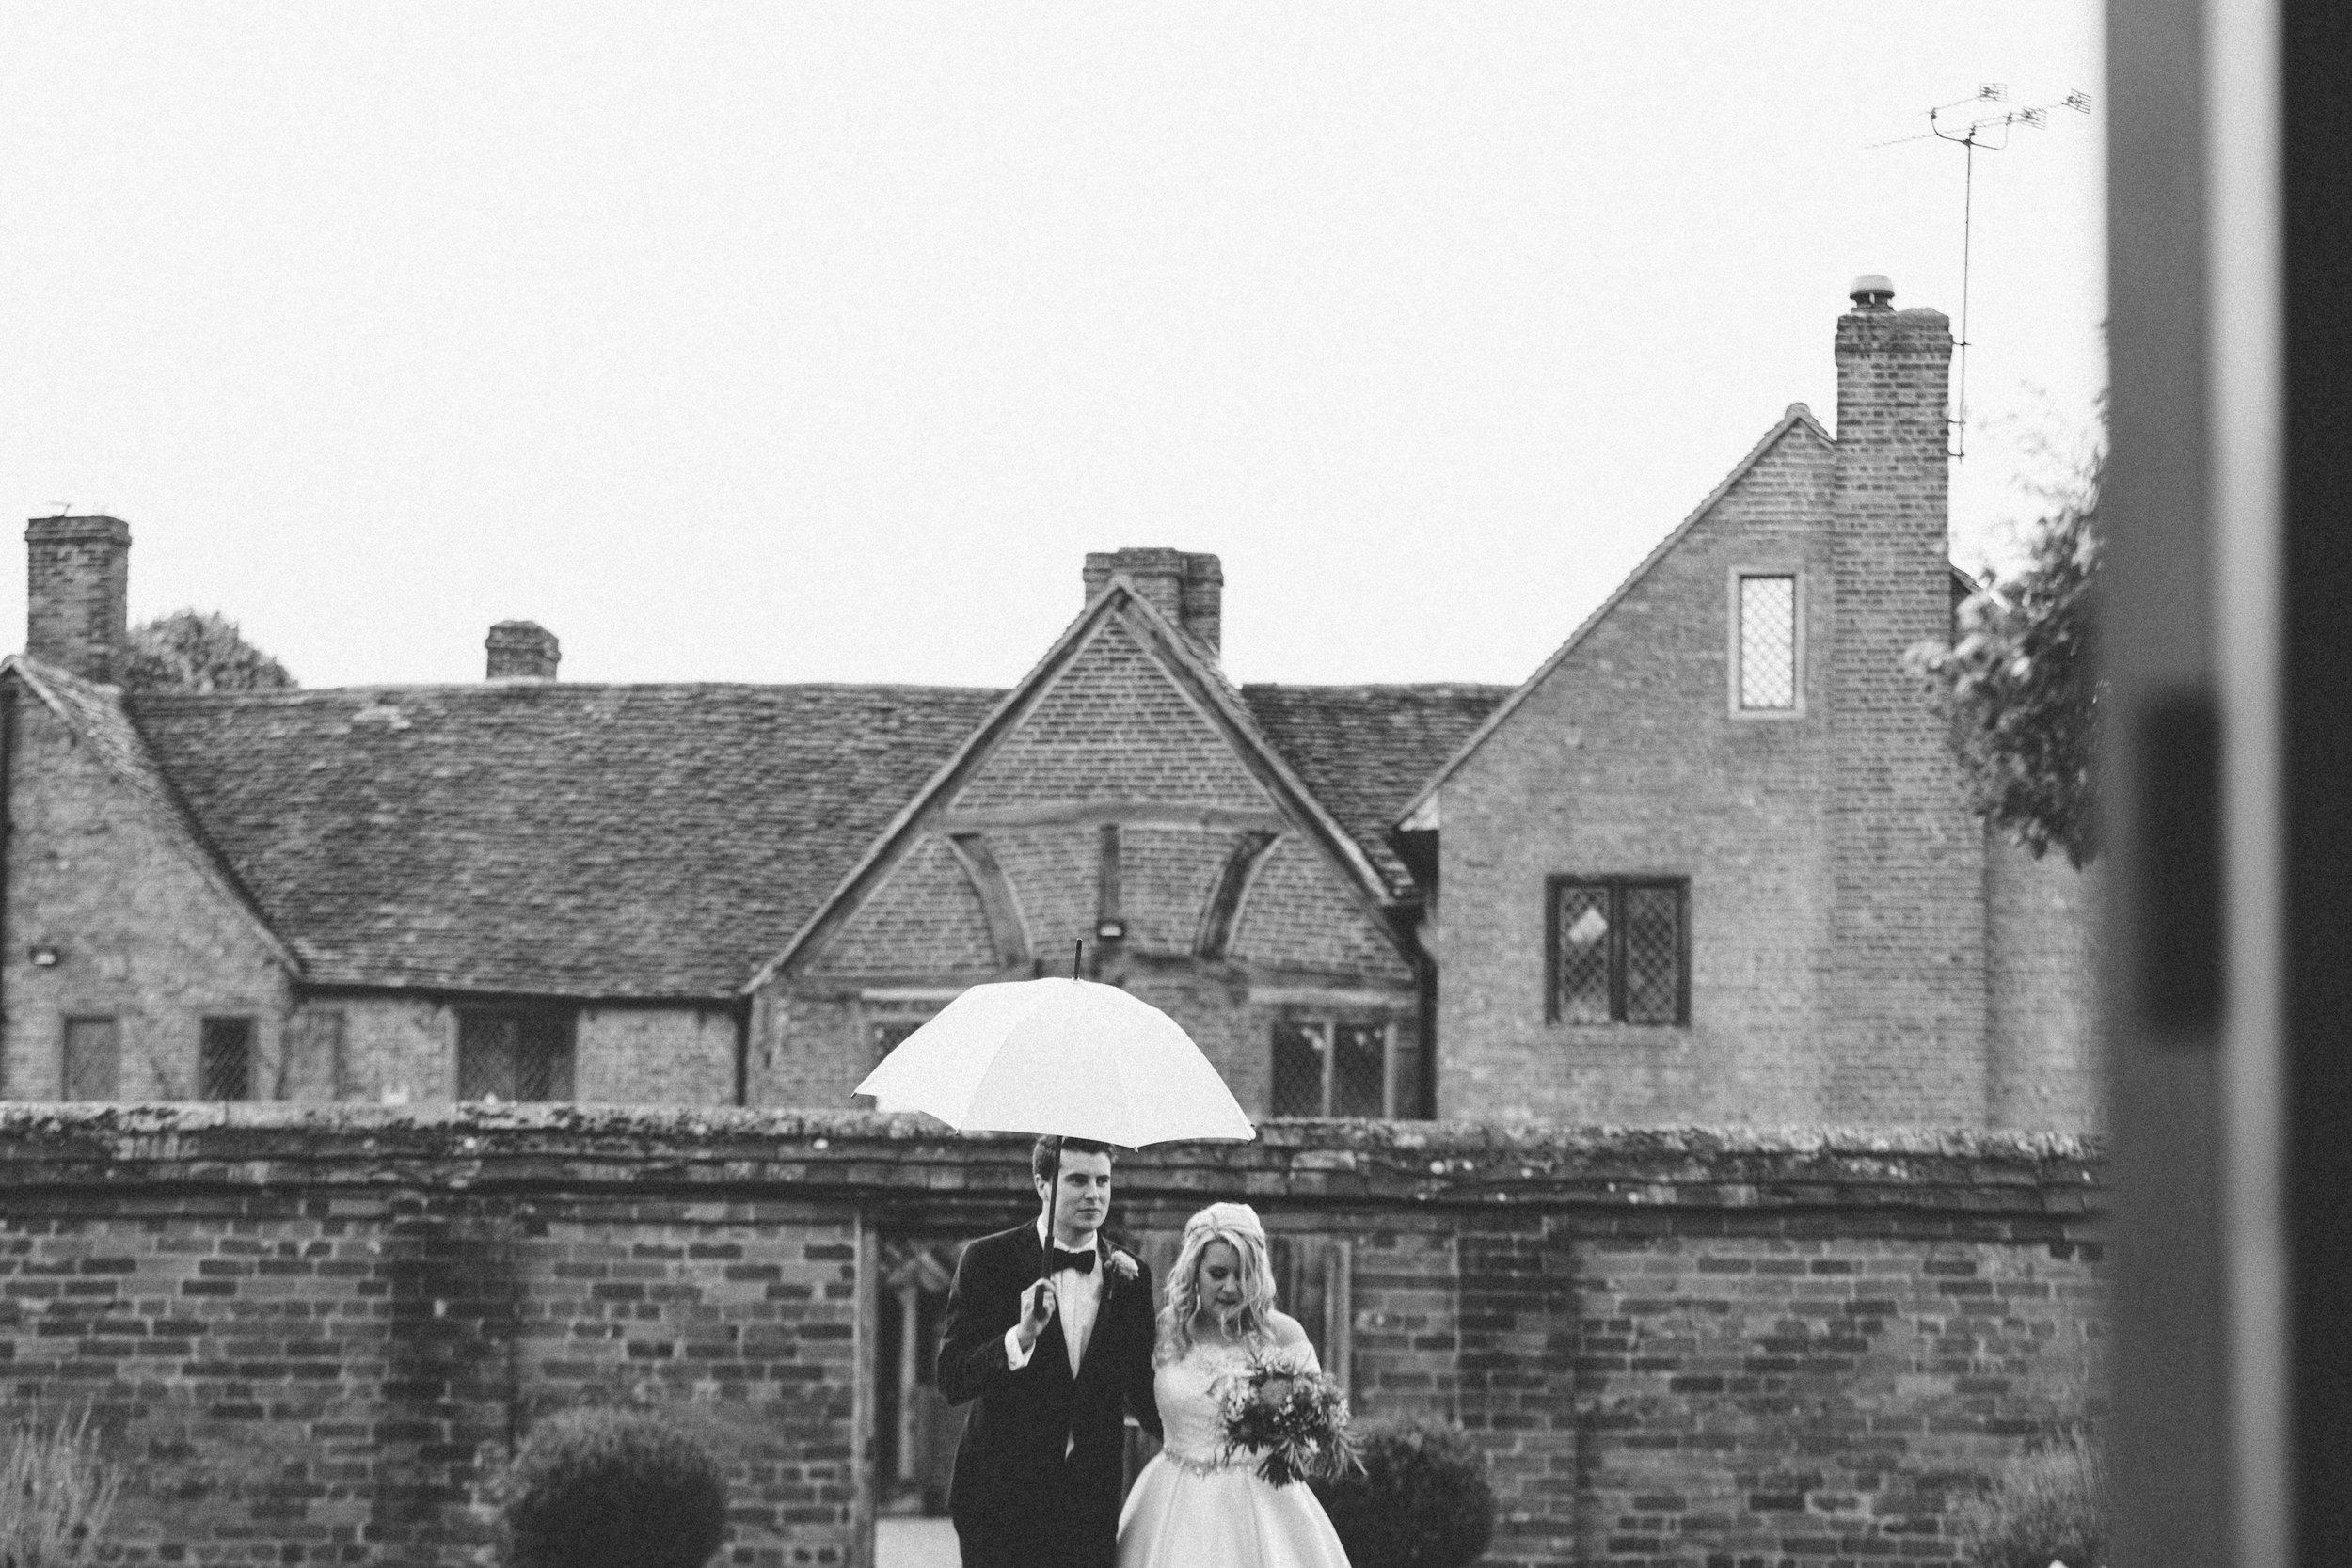 Tamara-and-Richard-Wedding-Highlights-59.jpg